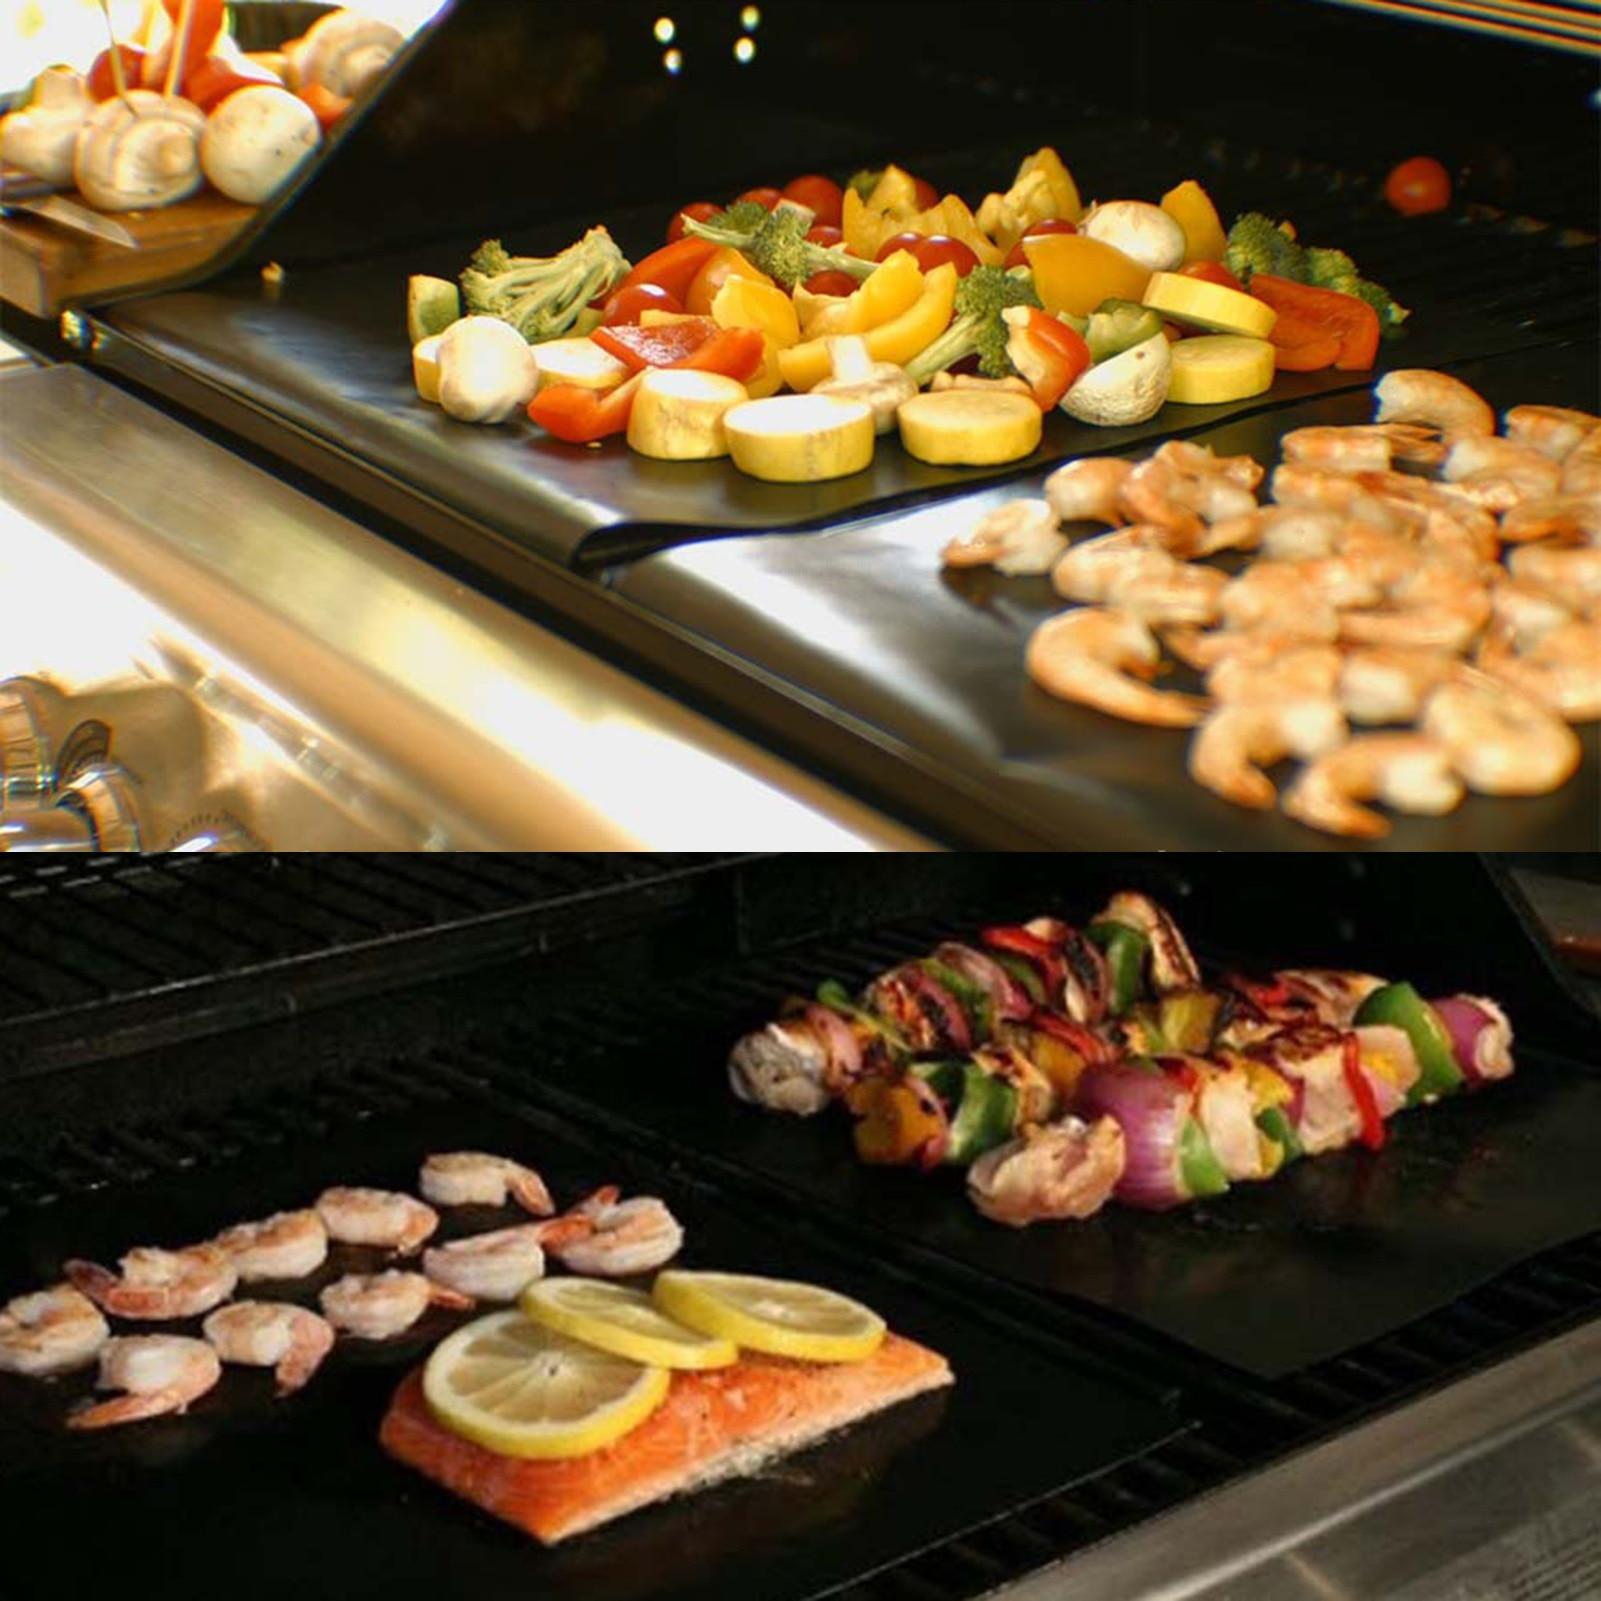 Reusable Non-Stick BBQ Grill Mat Baking Sheet Portable Picnic Barbecue Oven Tool